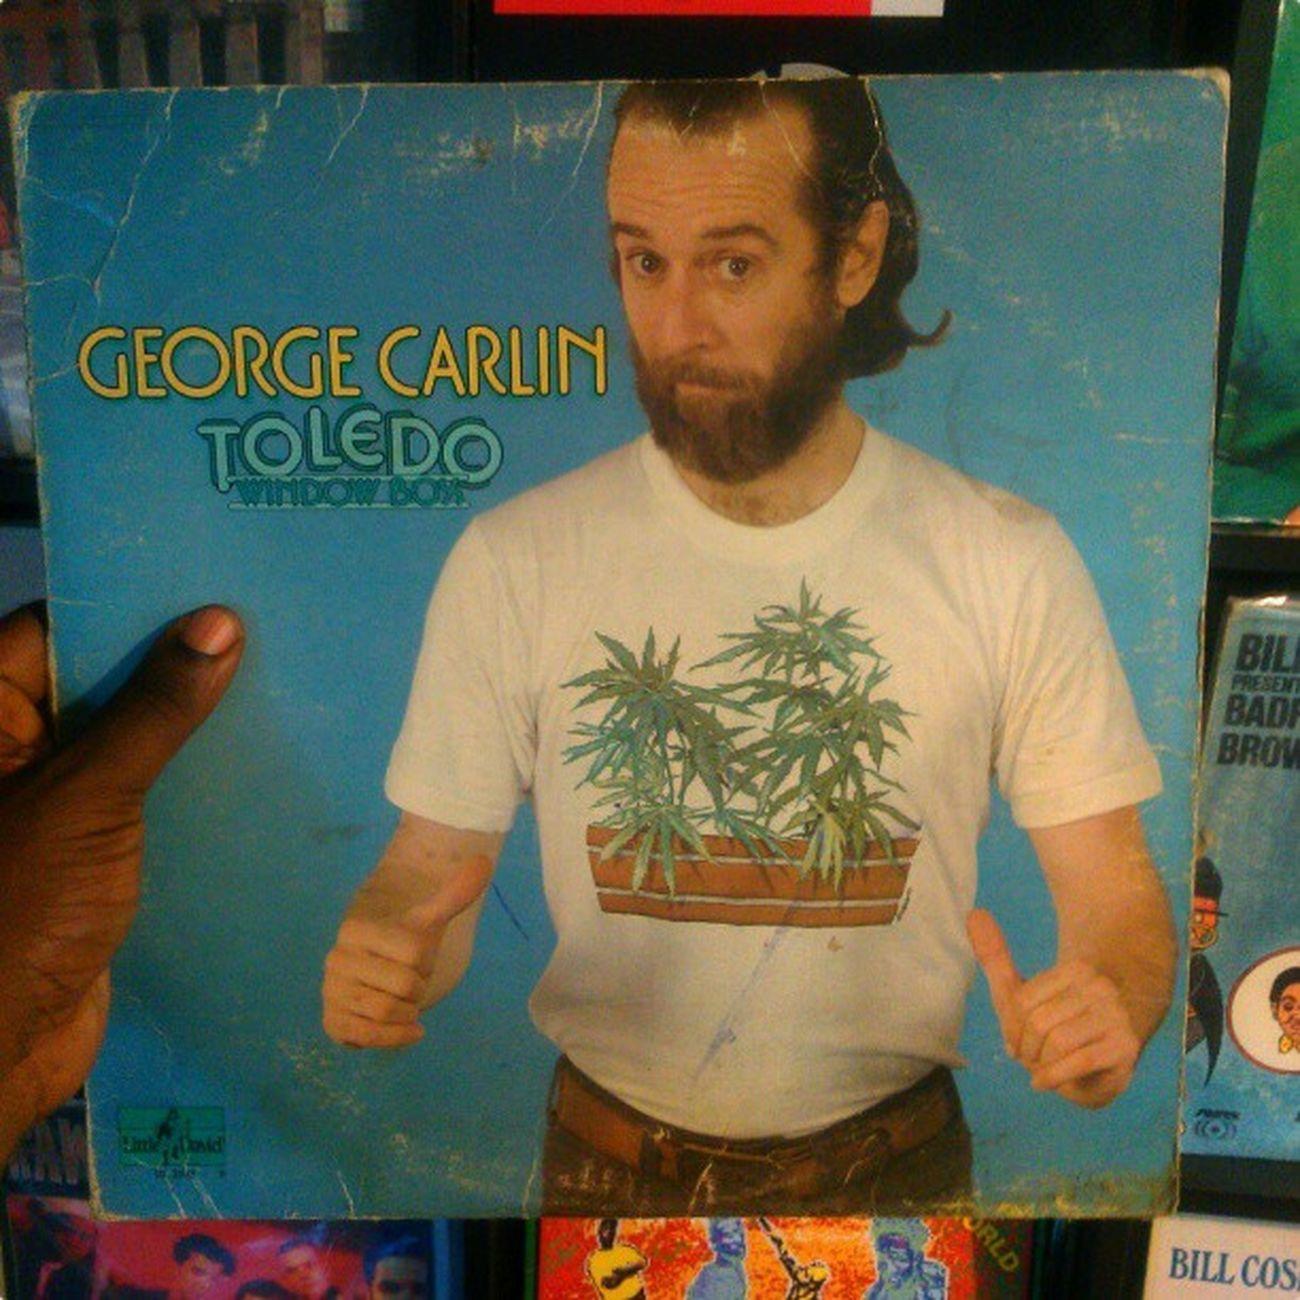 George Carlin Toledo Youaintgotnobeats Stuffifindcleaning